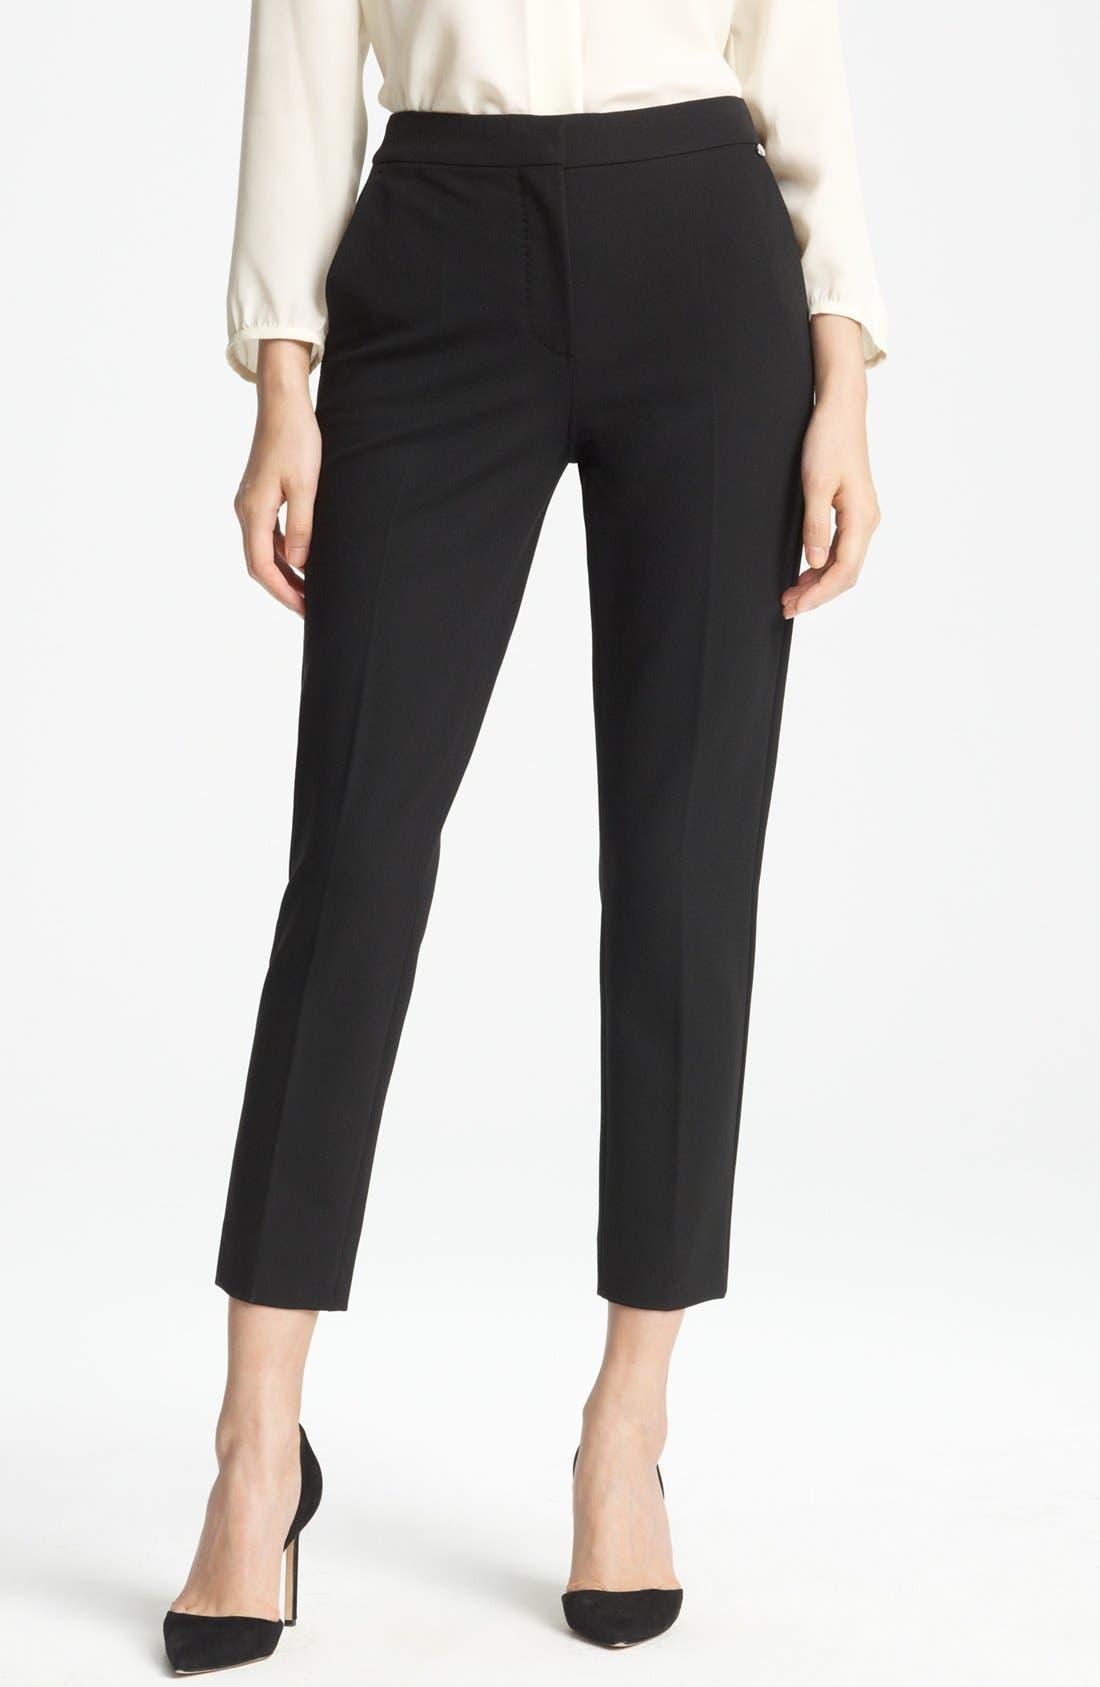 Main Image - Max Mara 'Pegno' Slim Jersey Pants